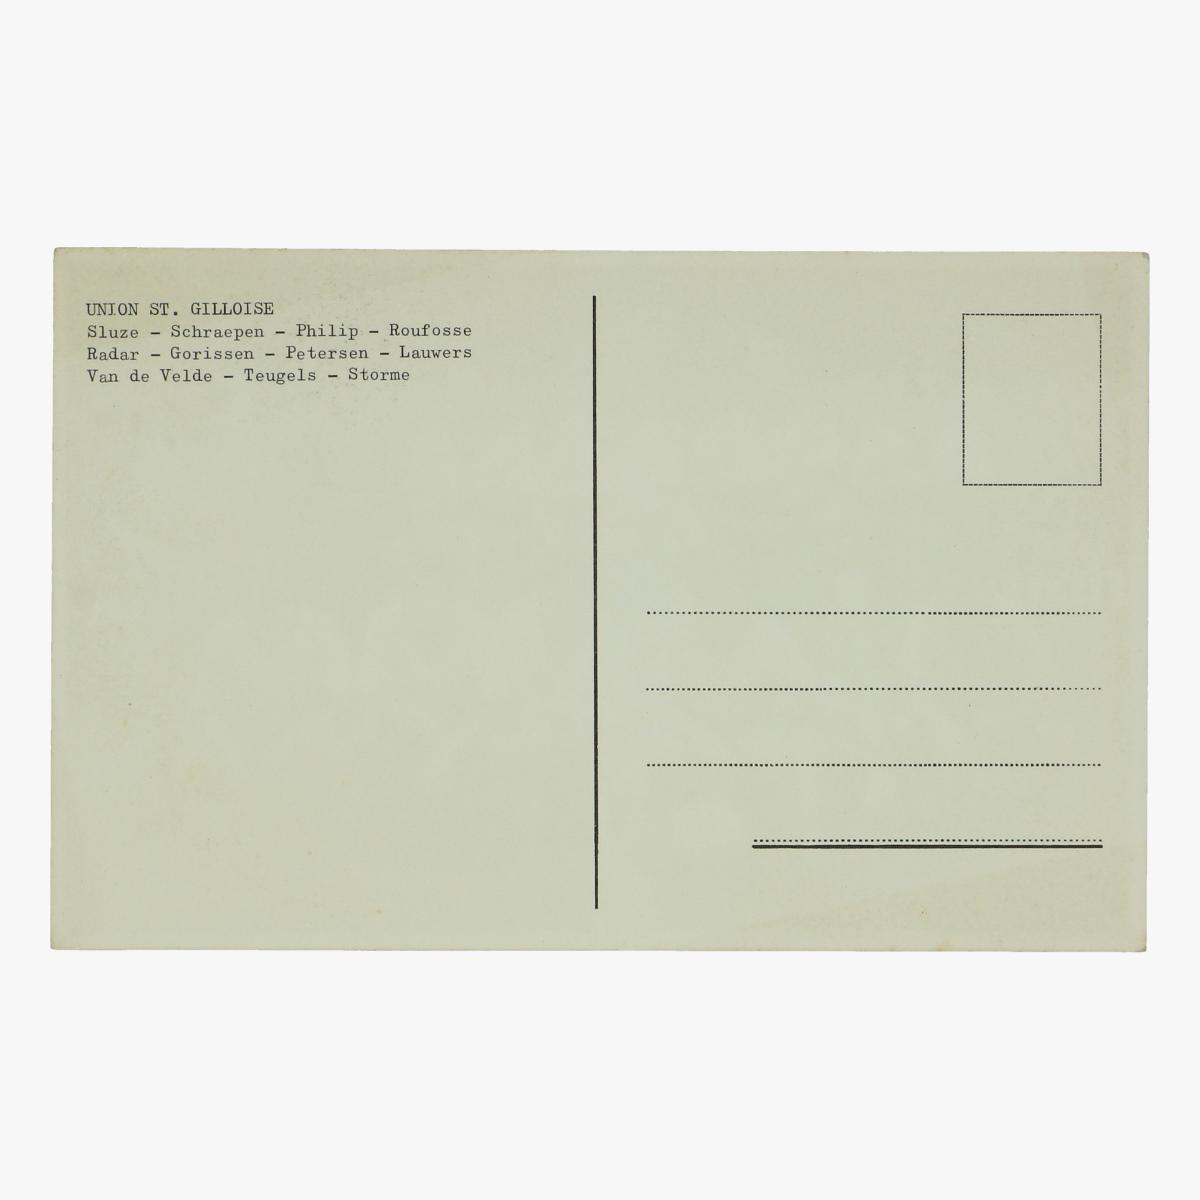 Afbeeldingen van oude postkaart voetbal union st. gilloise